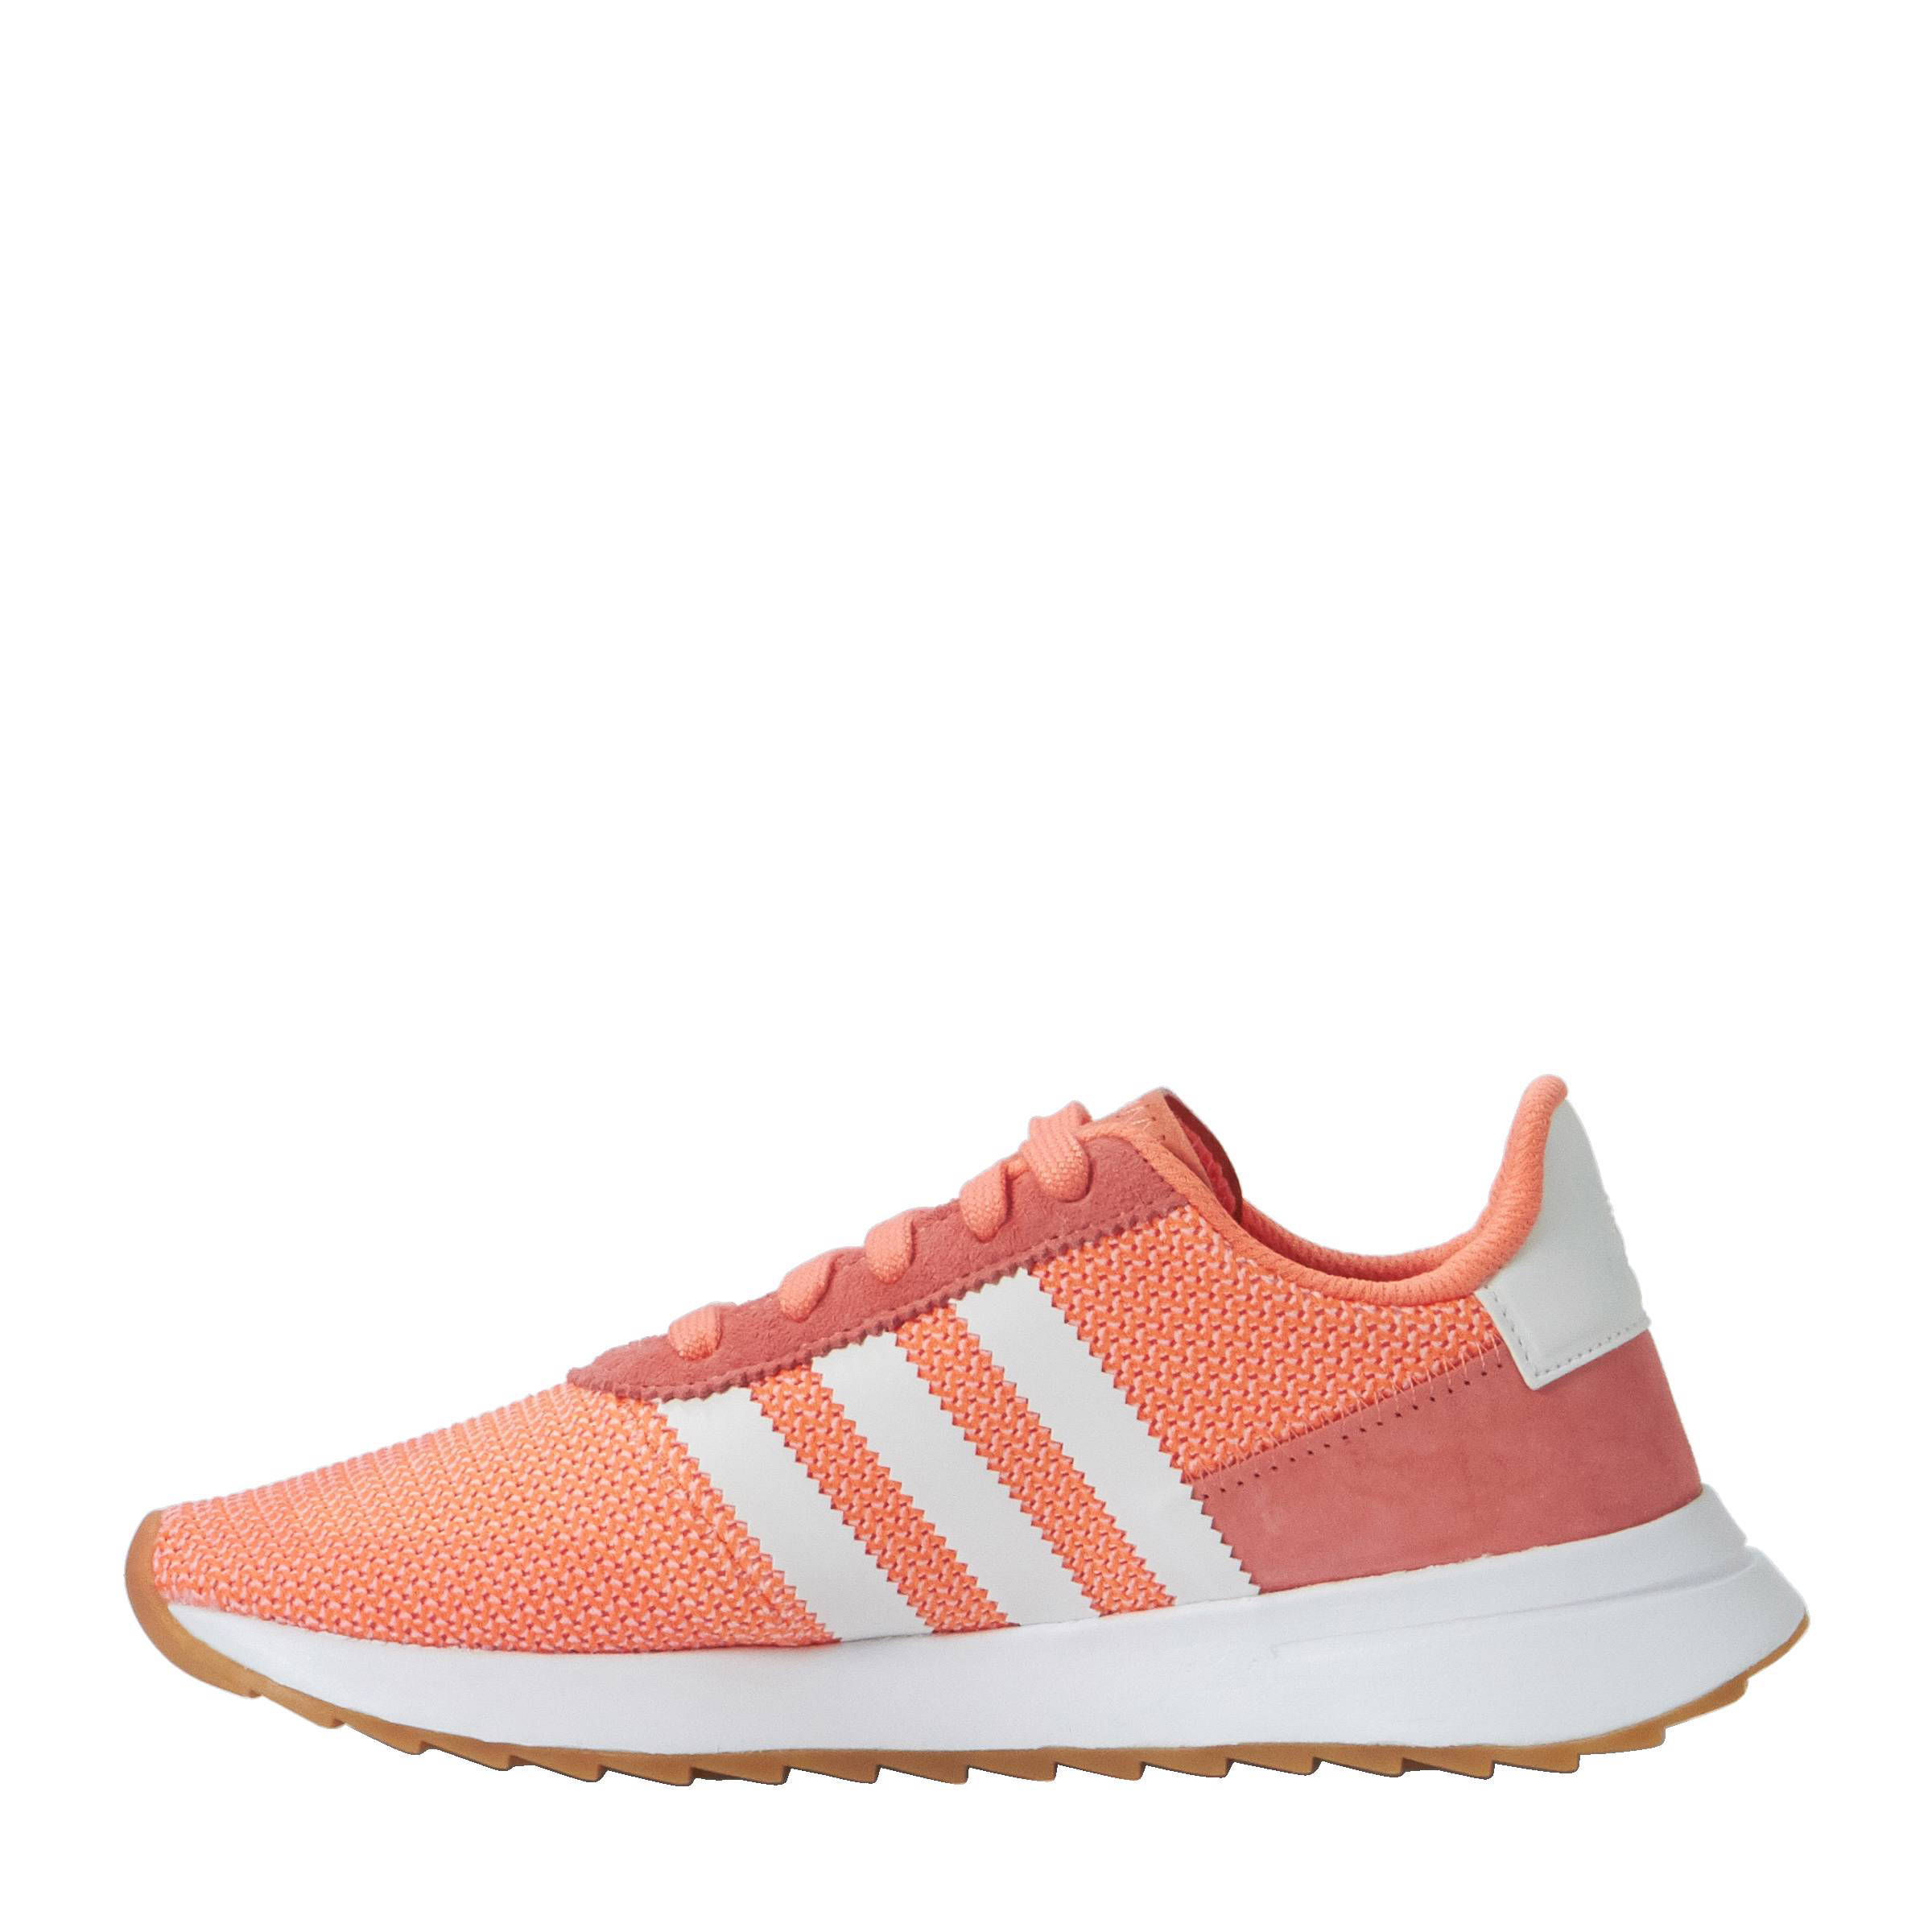 8c1e5be303f adidas originals FLB Runner W sneakers met leer